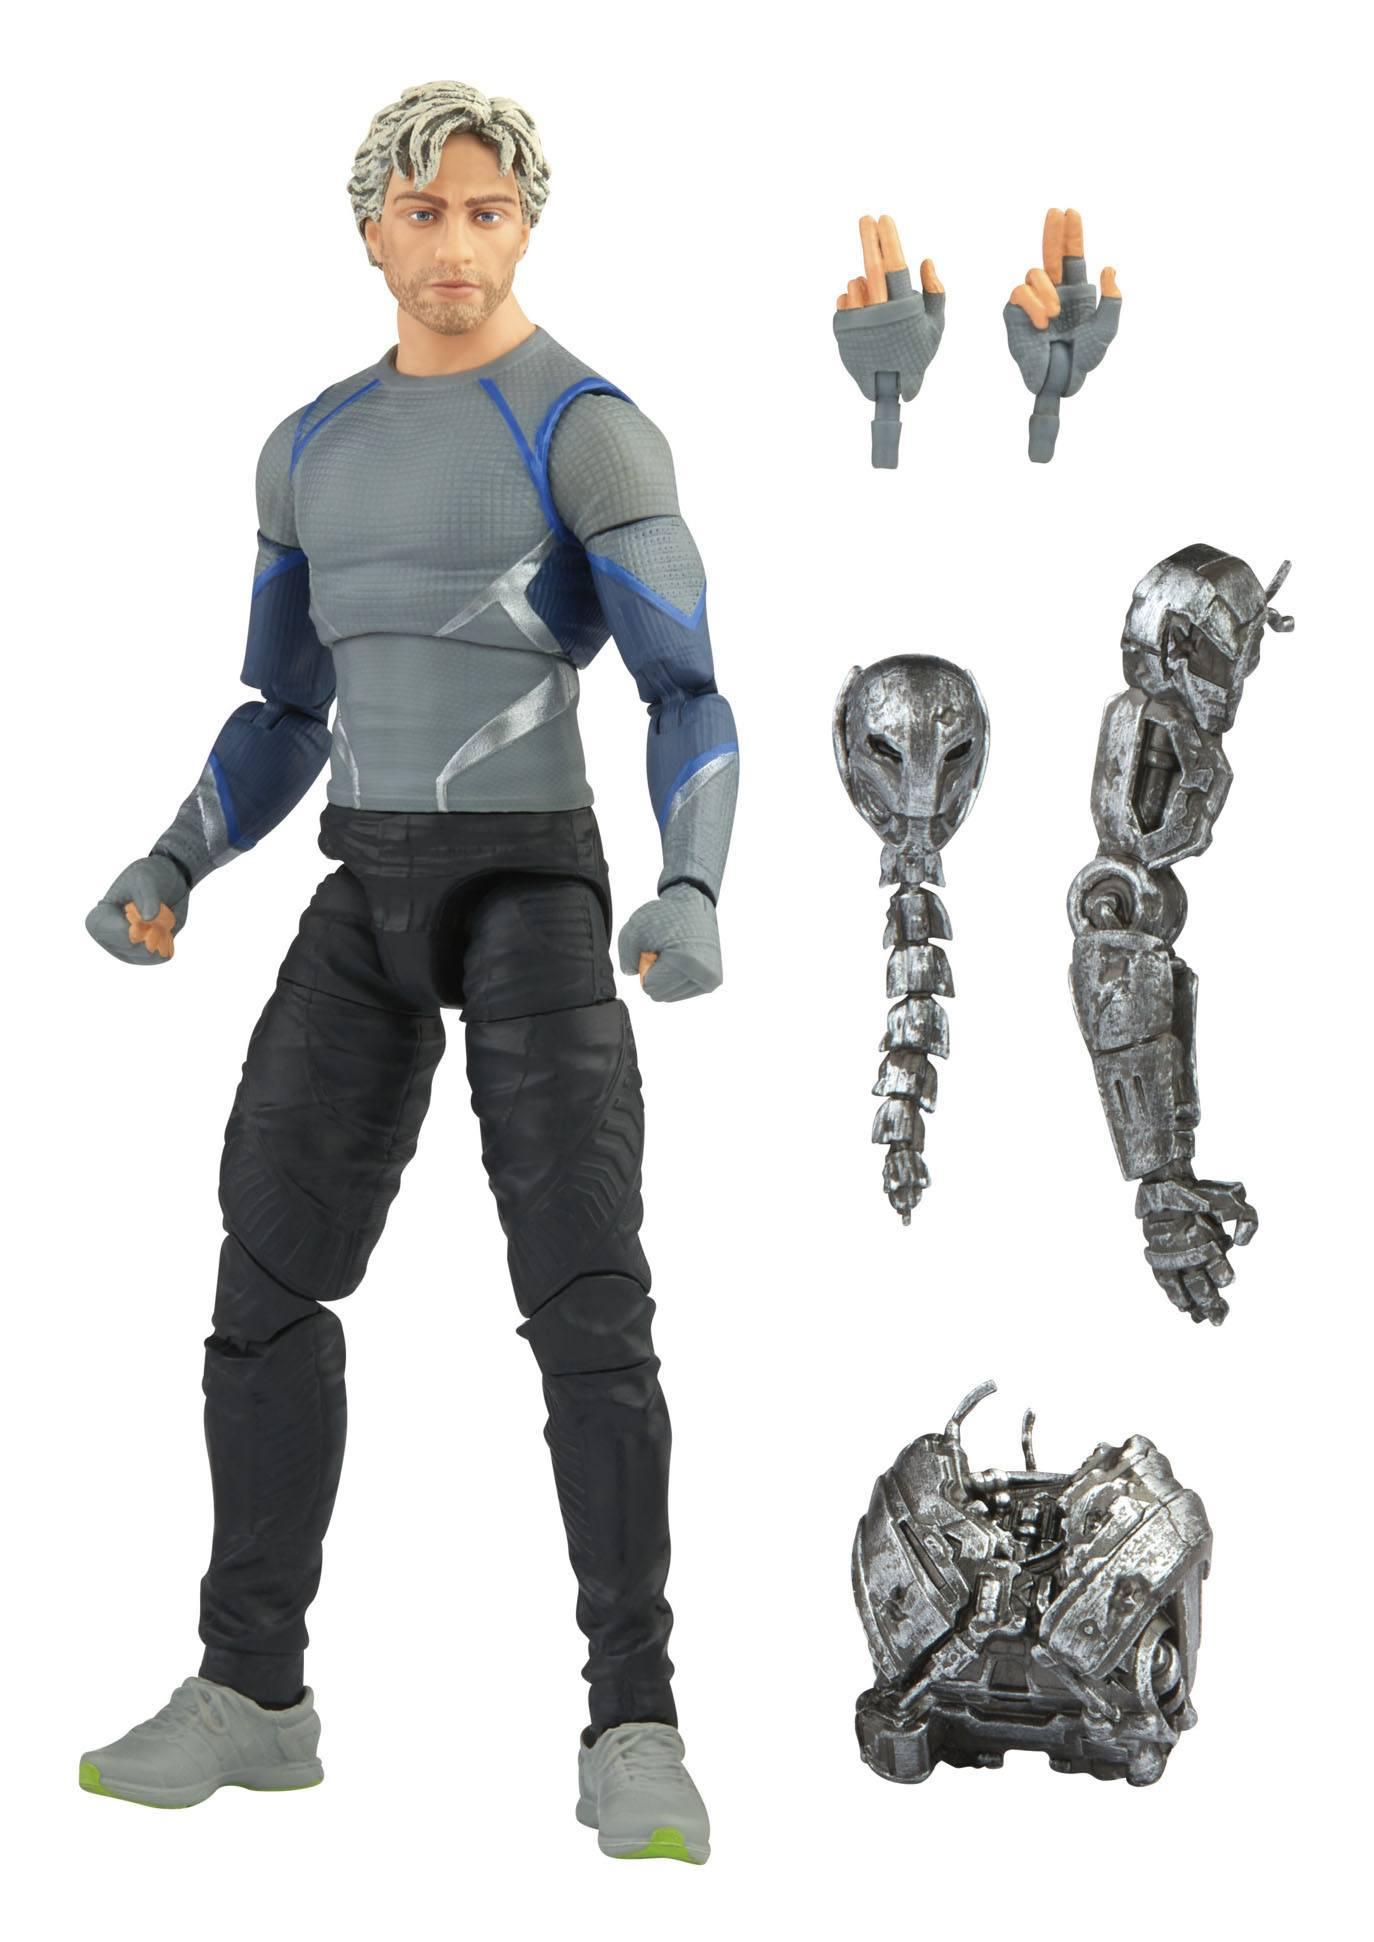 The Infinity Saga Marvel Legends Series Actionfigur 2021 Quicksilver (Avengers: Age of Ultron) 15 cm F01865L0 5010993839285